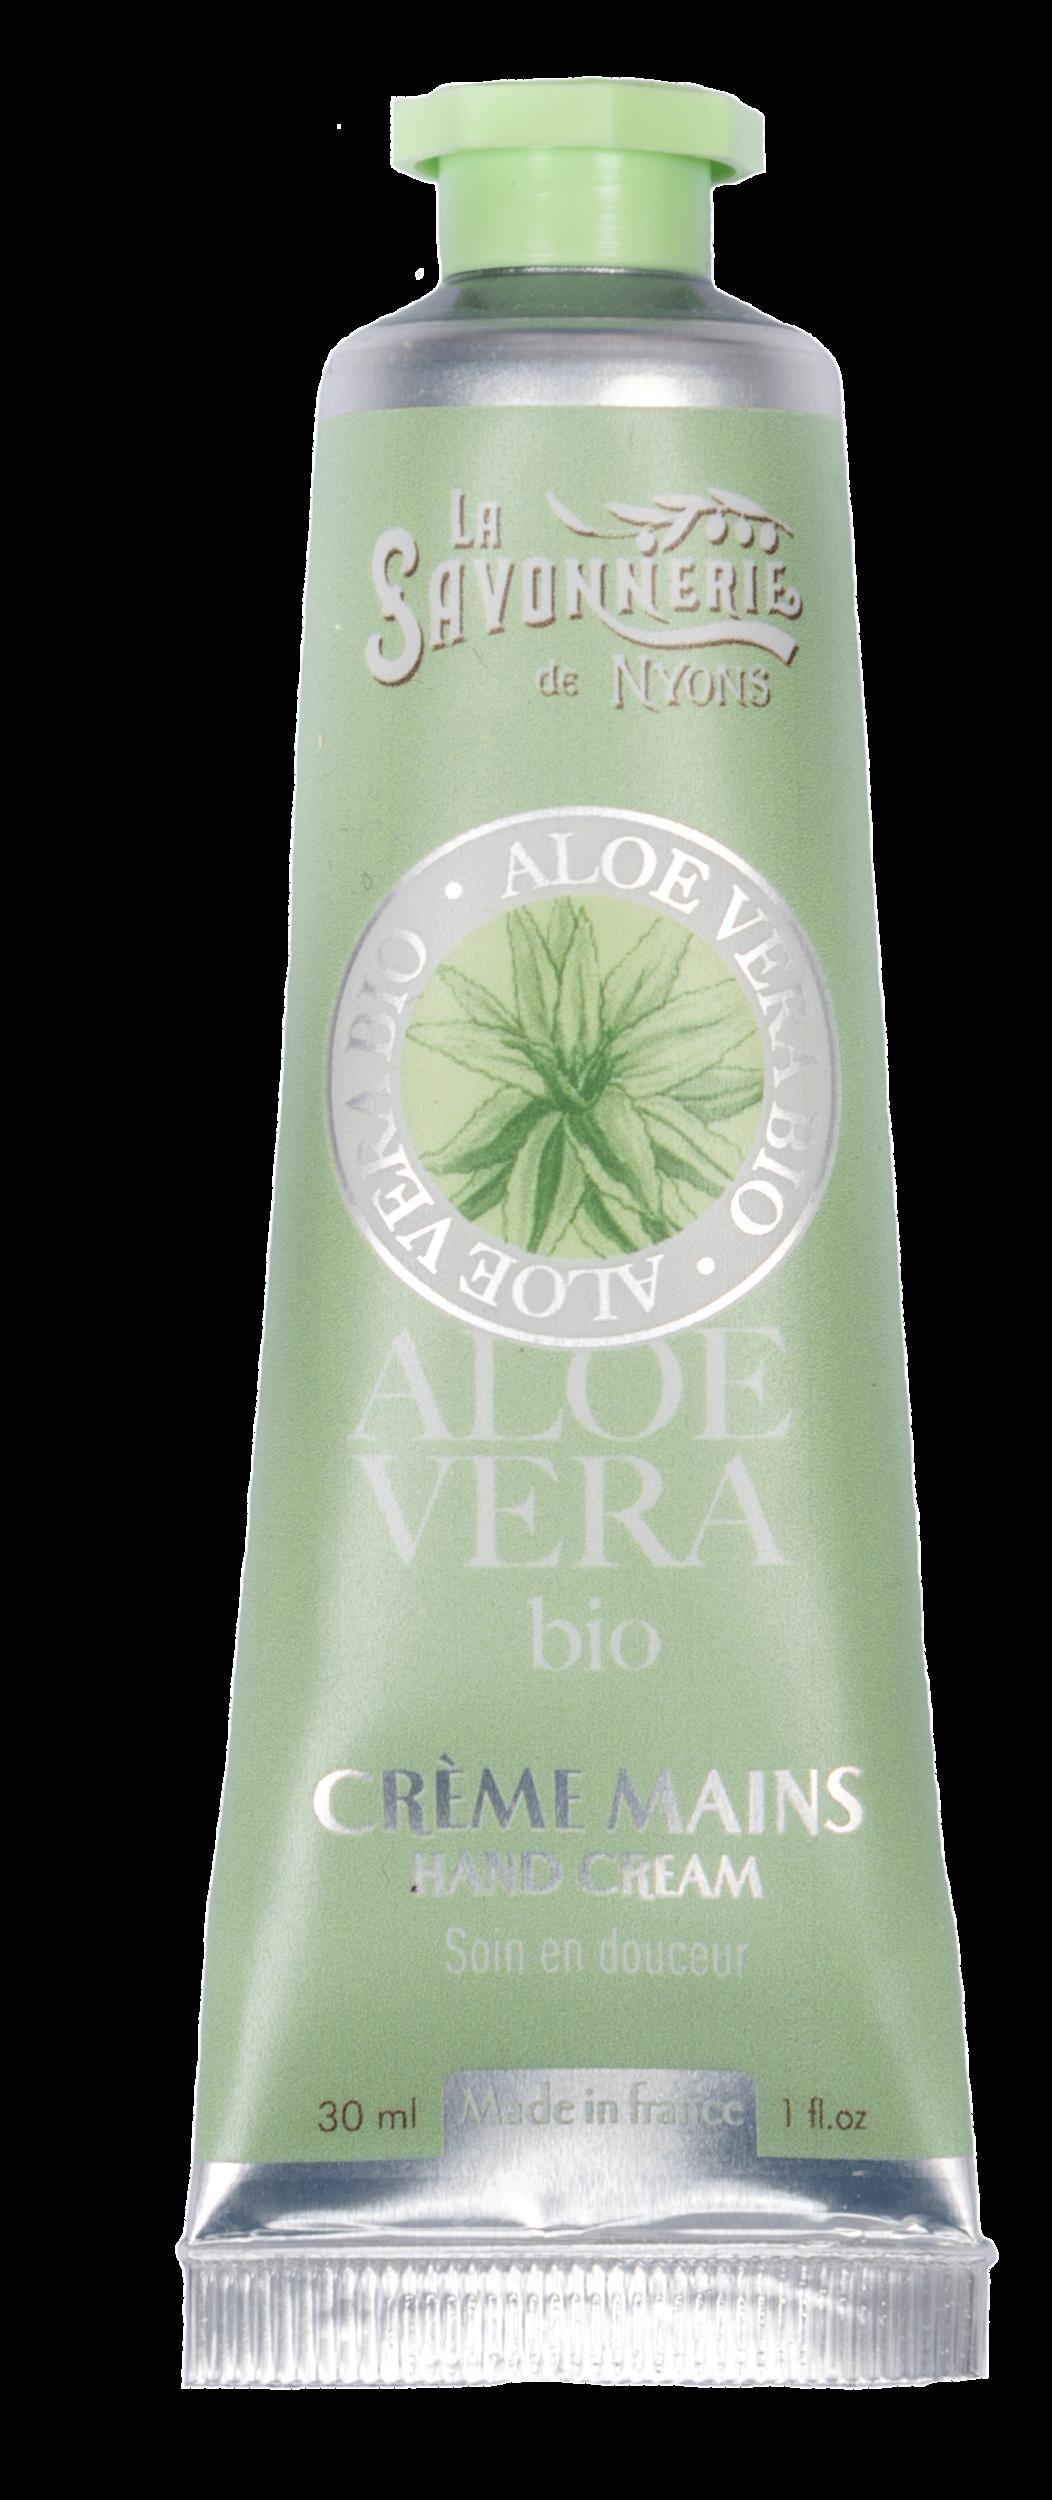 Crème Mains Aloe Vera BIO 30 ml